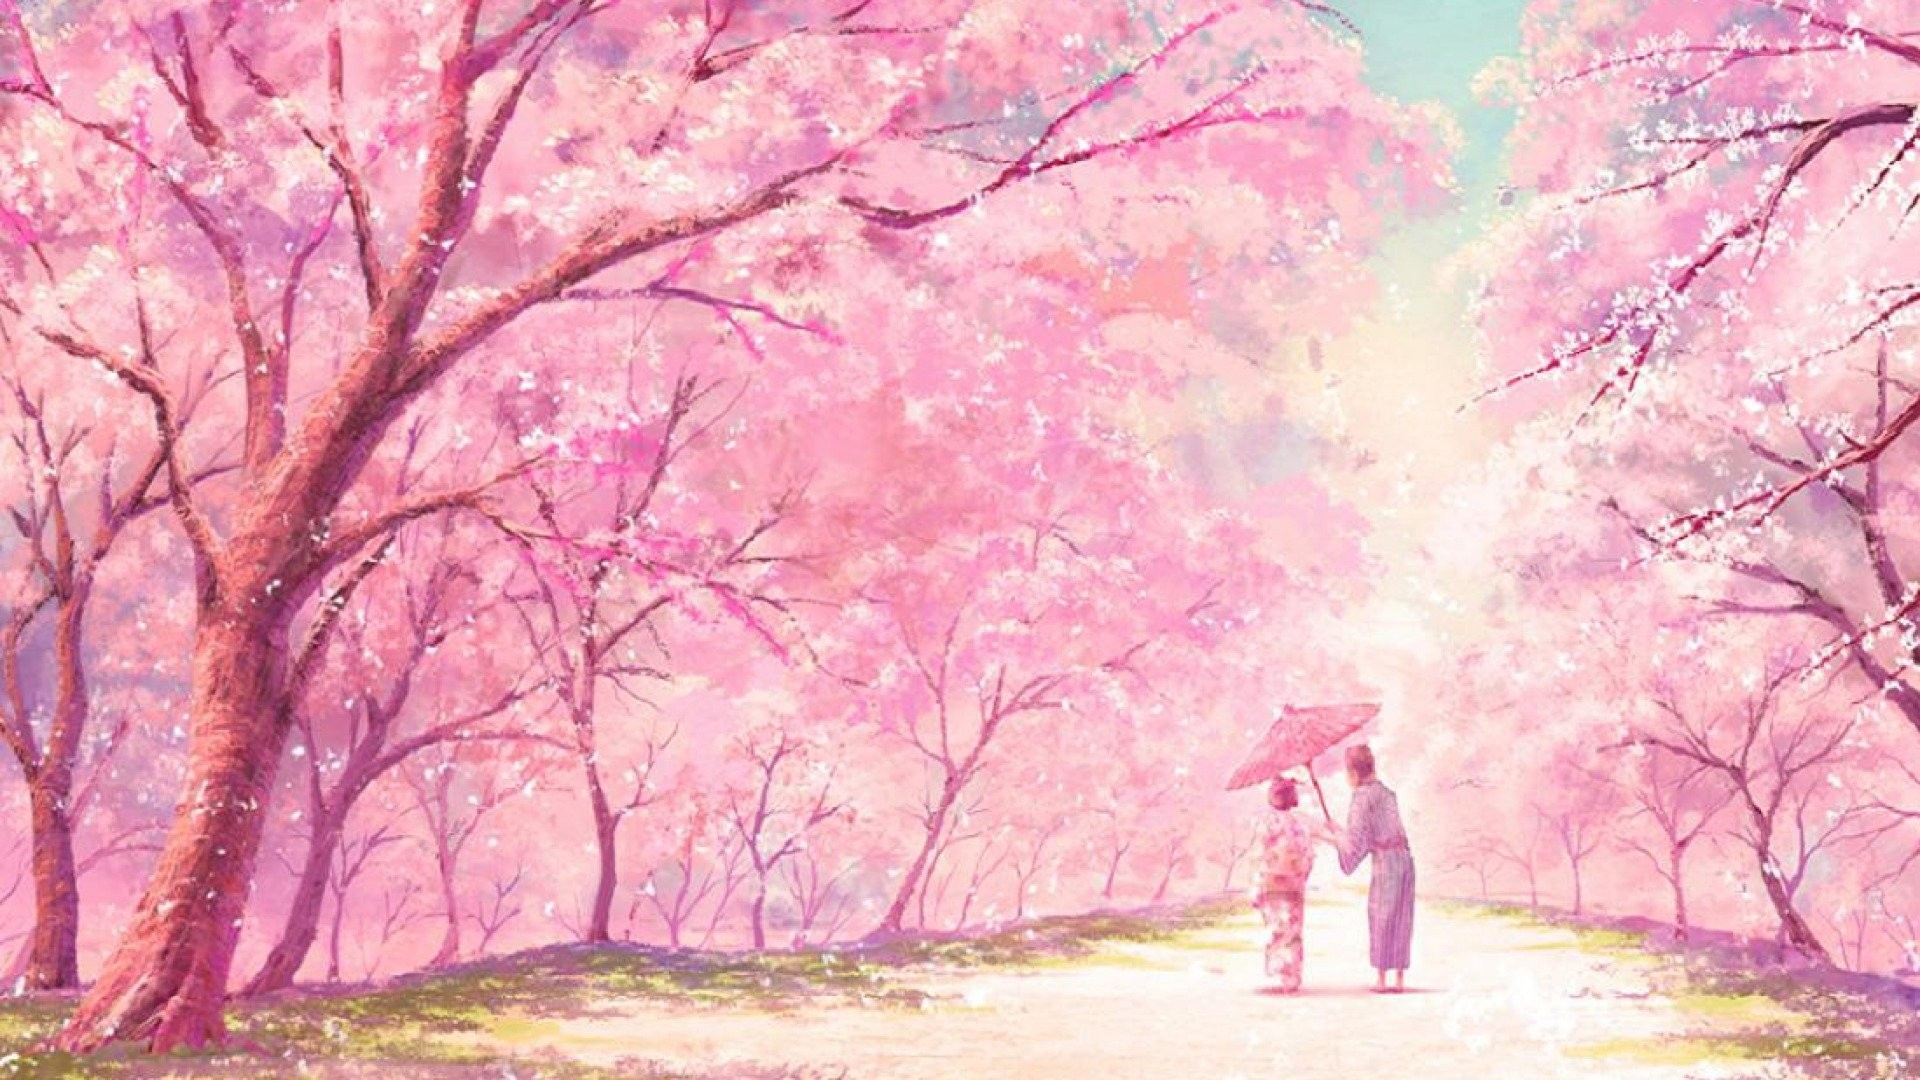 Girlish Hello Kitty Pink Cute Japan Cat   Data Src - Japanese Cherry Blossom Anime - HD Wallpaper